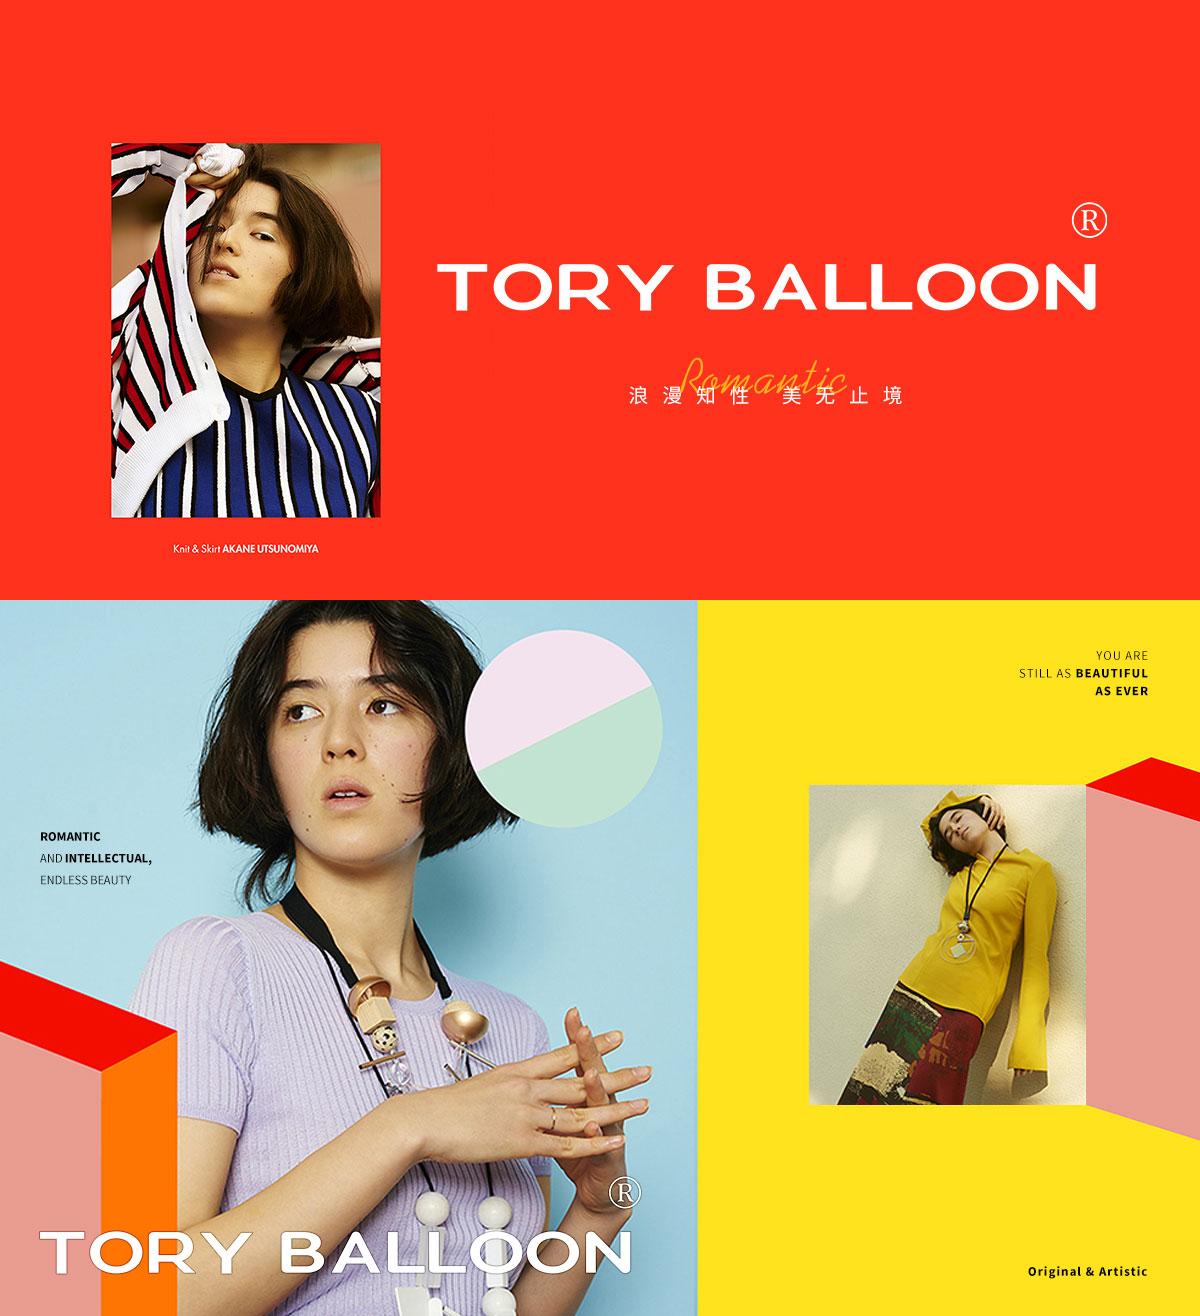 TORY BALLOON